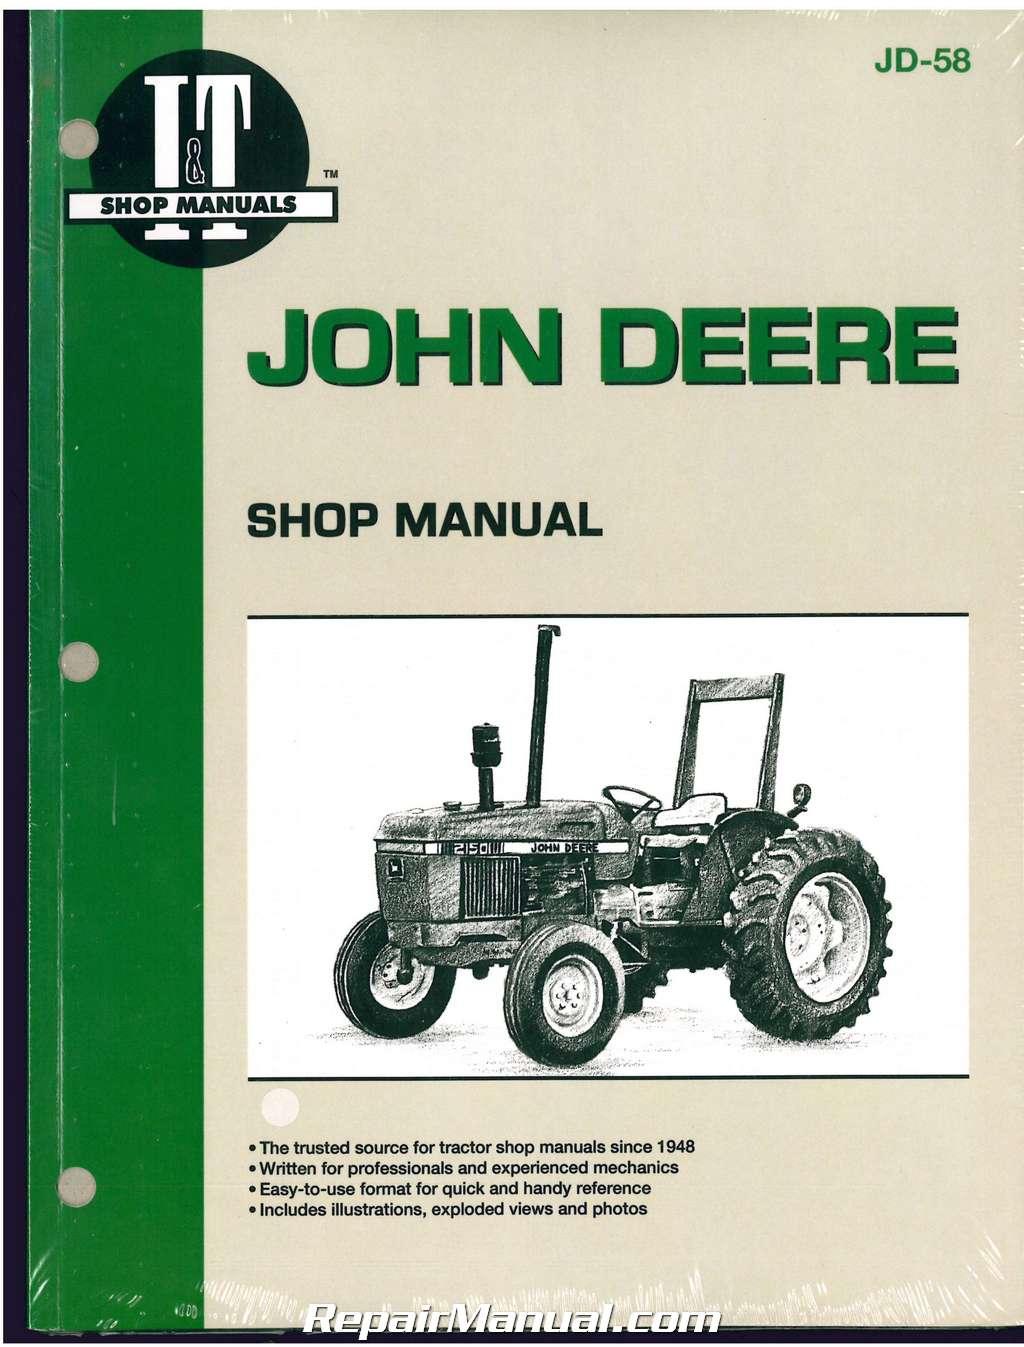 Poulan 2150 User Manual Jpeg Image Sirius Wiring Diagram For The Jeep Liberty Kj Array John Deere Owners Manuals Rh Mygreen Farm